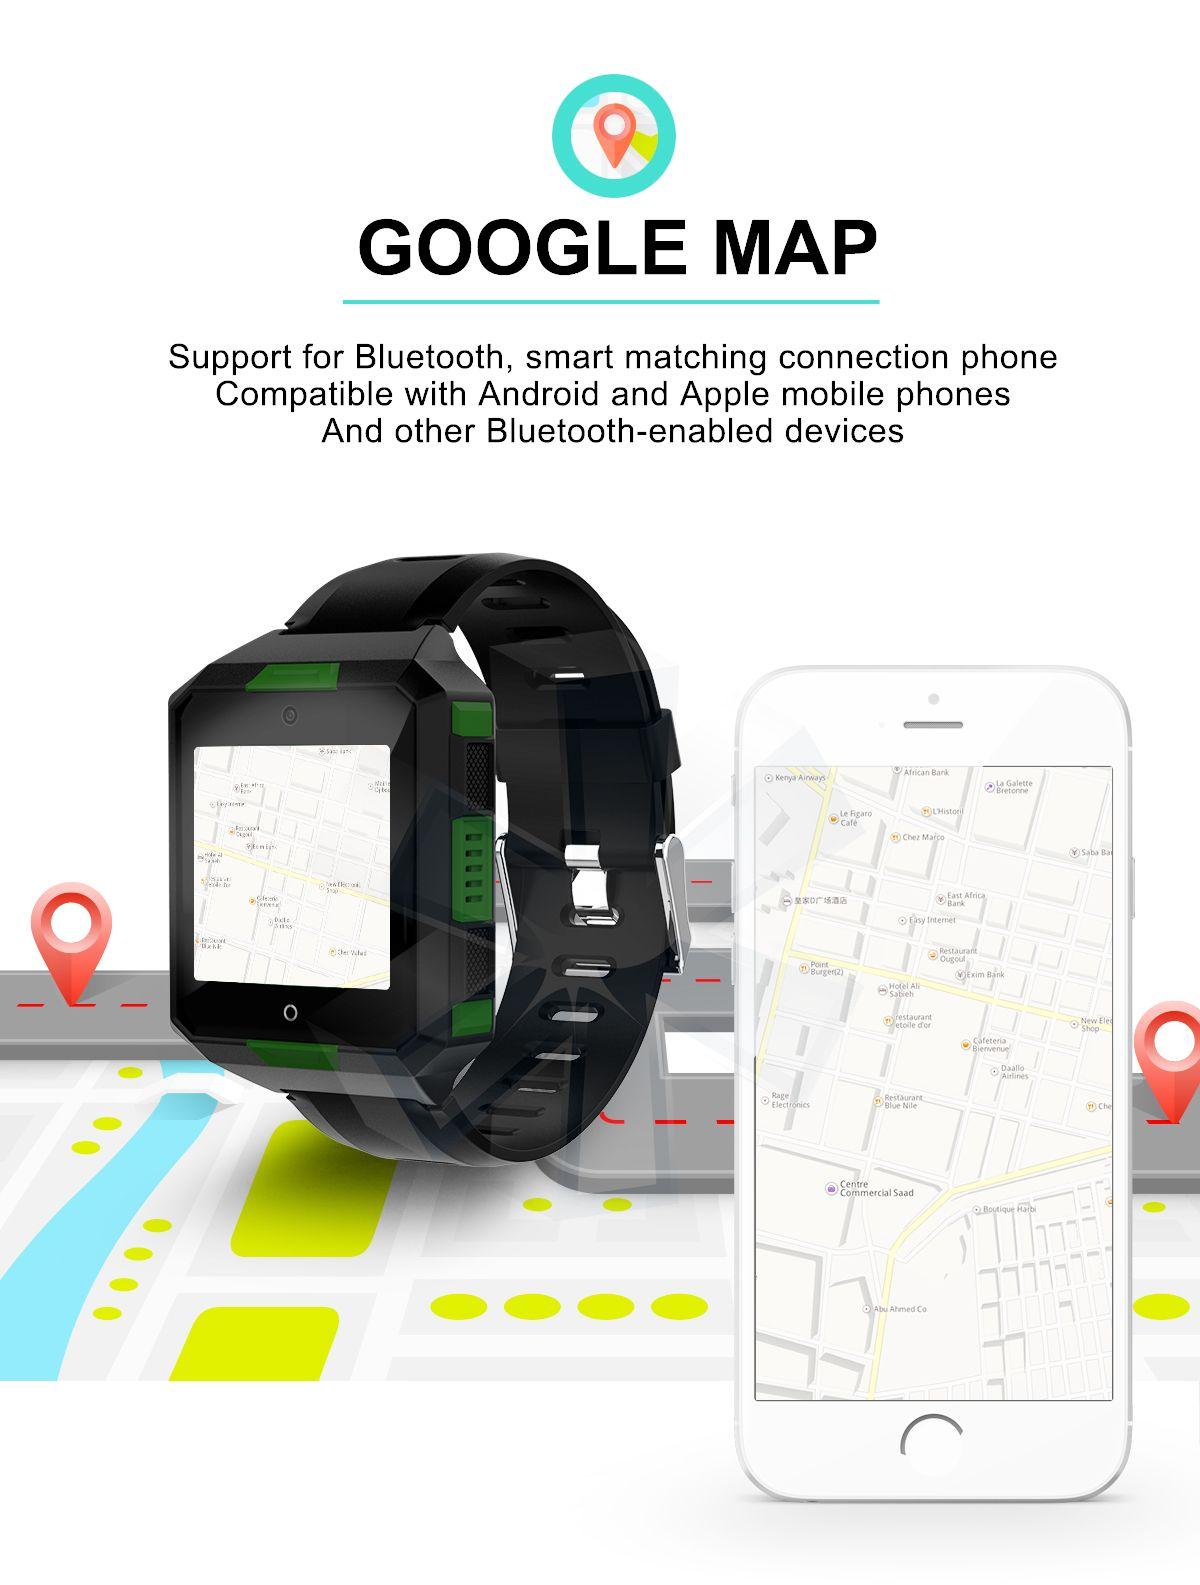 Smartwatch 4G LTE Smartwatch MTK6737 da 1 GB, 8 GB, Nano-SIM, Android 6.0, 2.0MP, fotocamera, WiFi, frequenza cardiaca, pressione Boold, IP67, impermeabile, Smartwatch